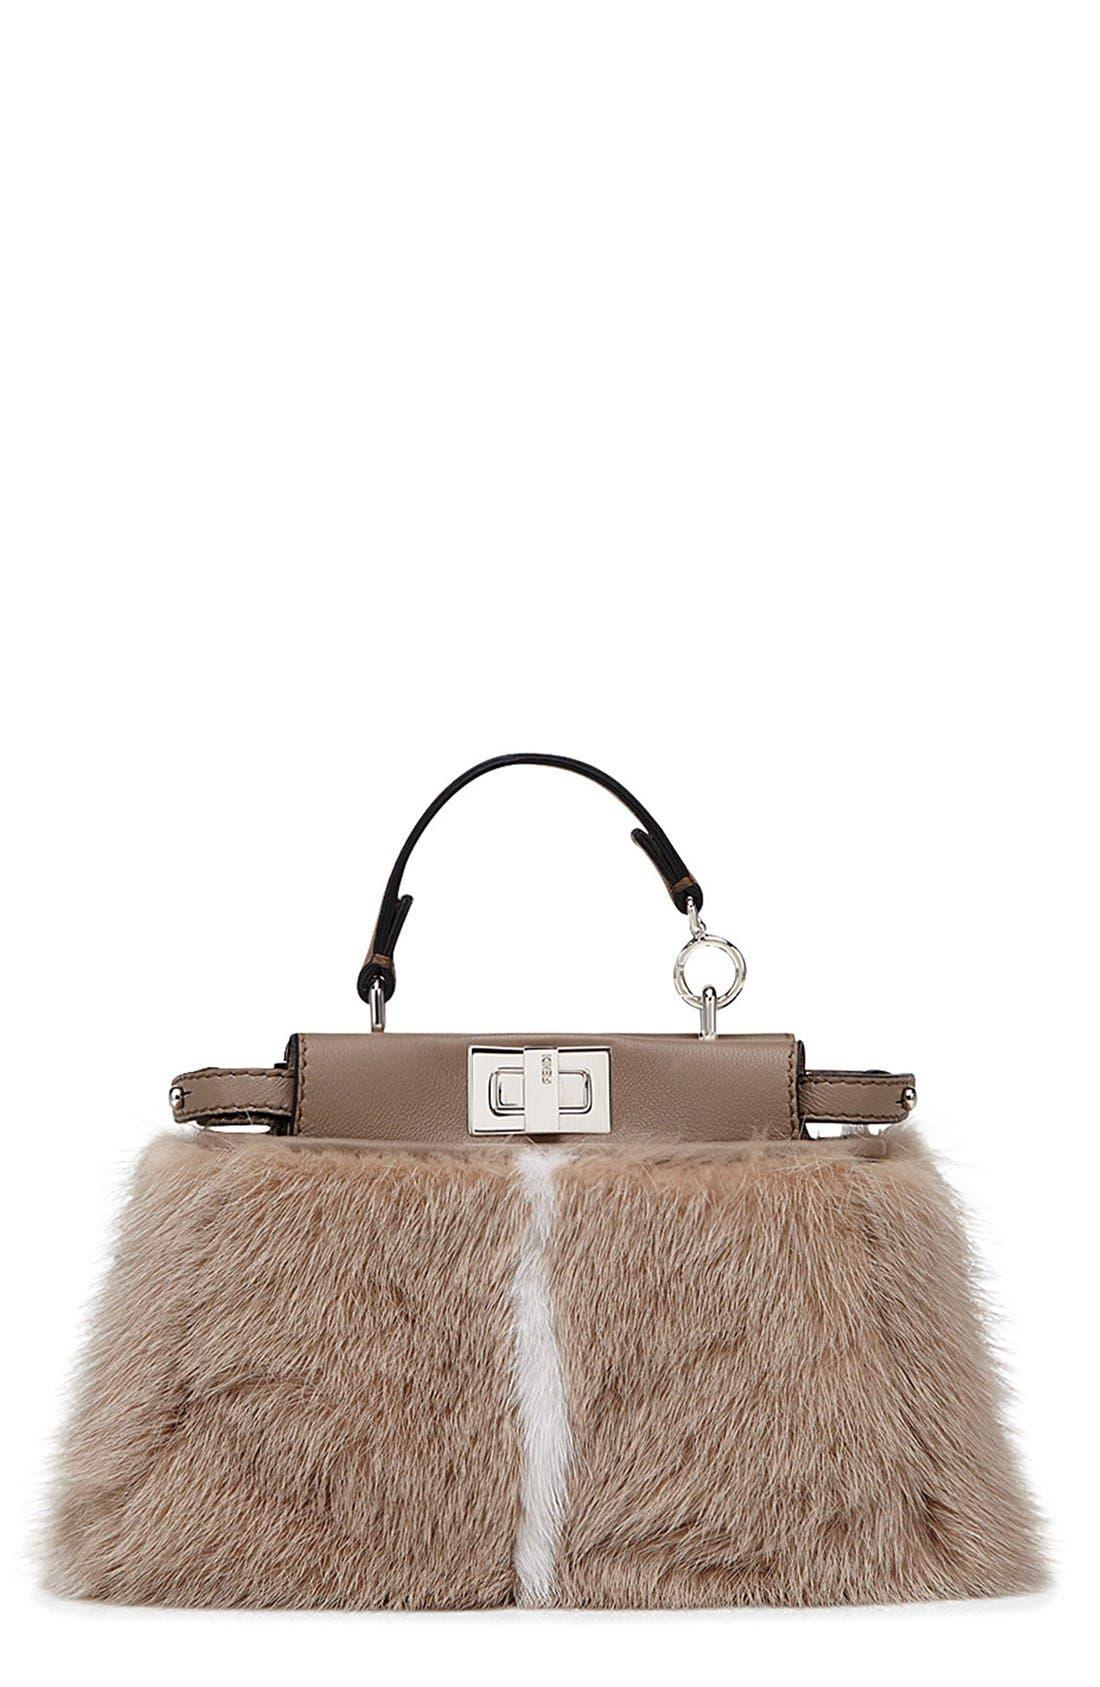 Alternate Image 1 Selected - Fendi 'Micro Peekaboo' Genuine Mink Fur & Leather Bag (Extra Small)